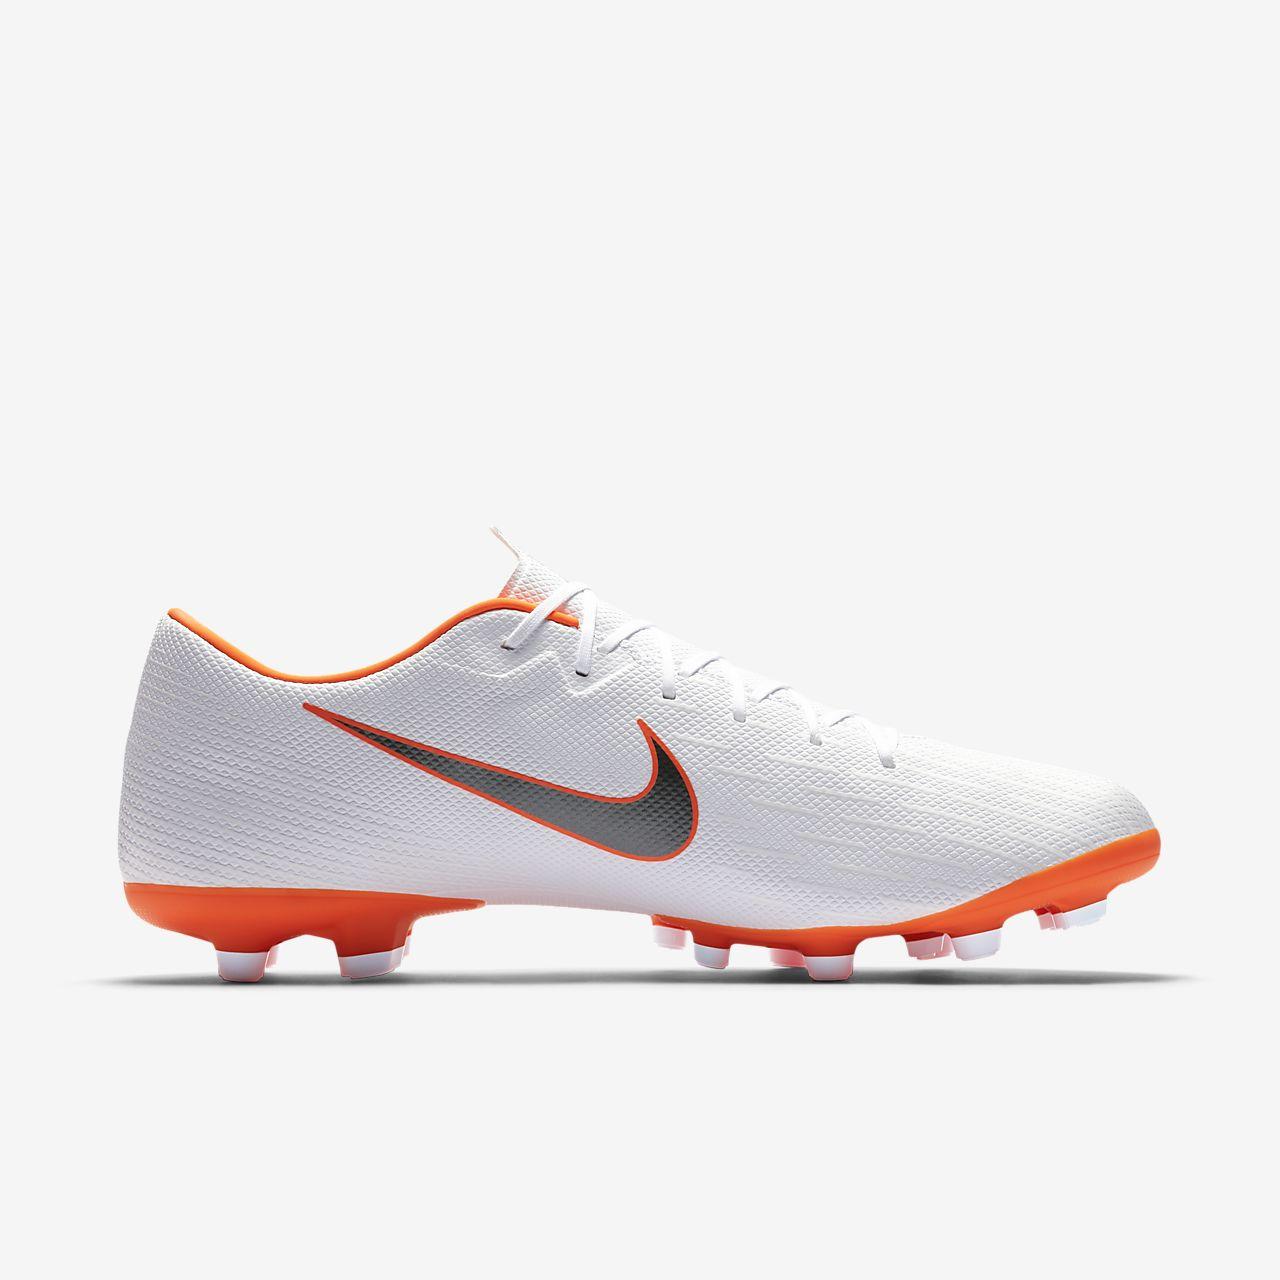 footwear 7fe49 10b9a total orangetotal orangevoltNoir nike